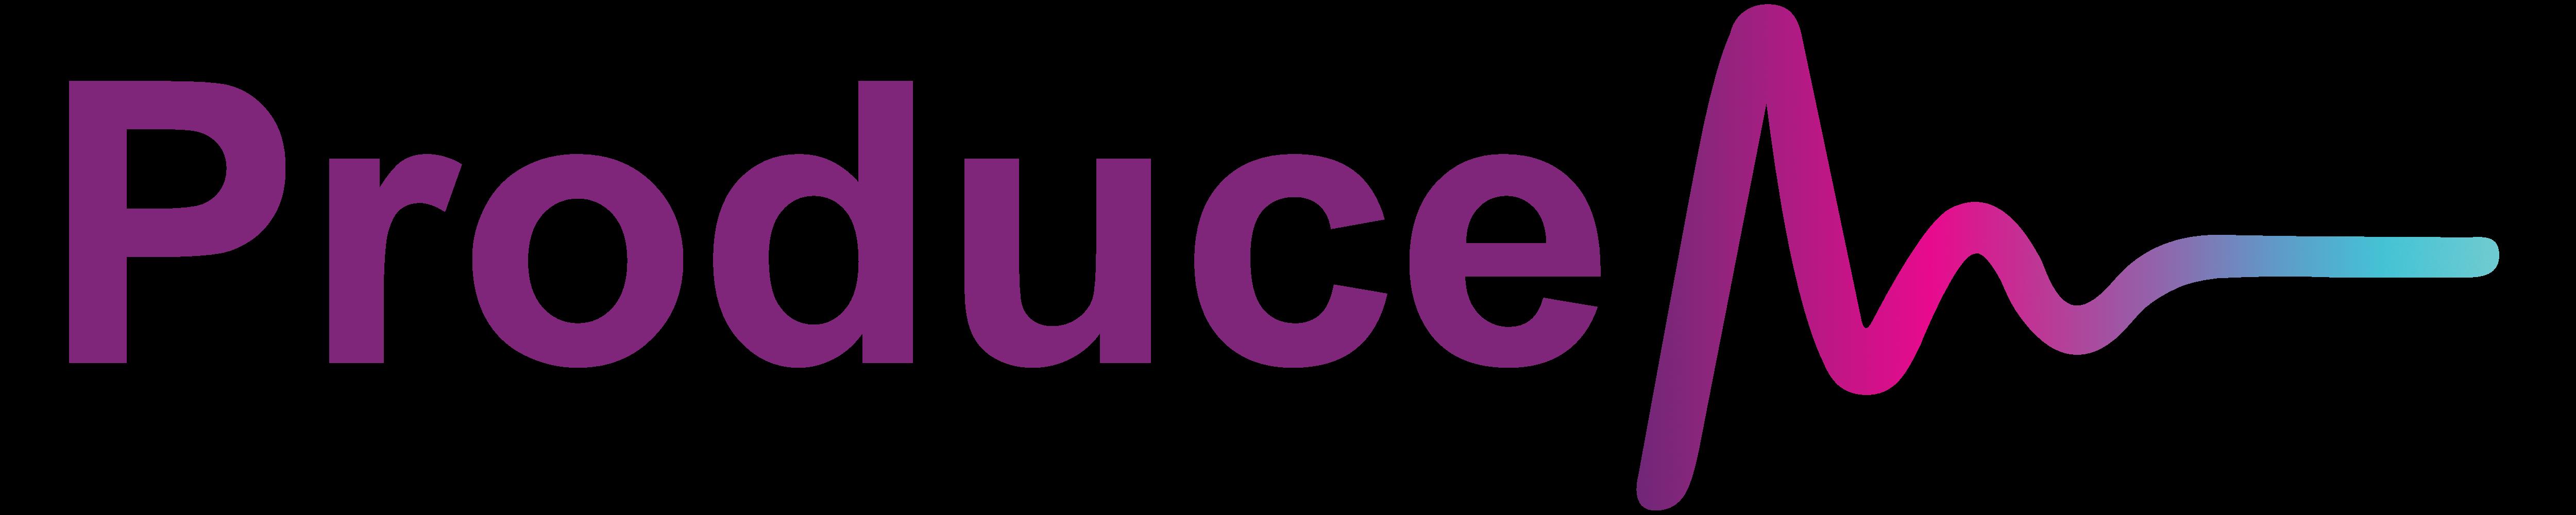 Logo Produce Audio Horizontal